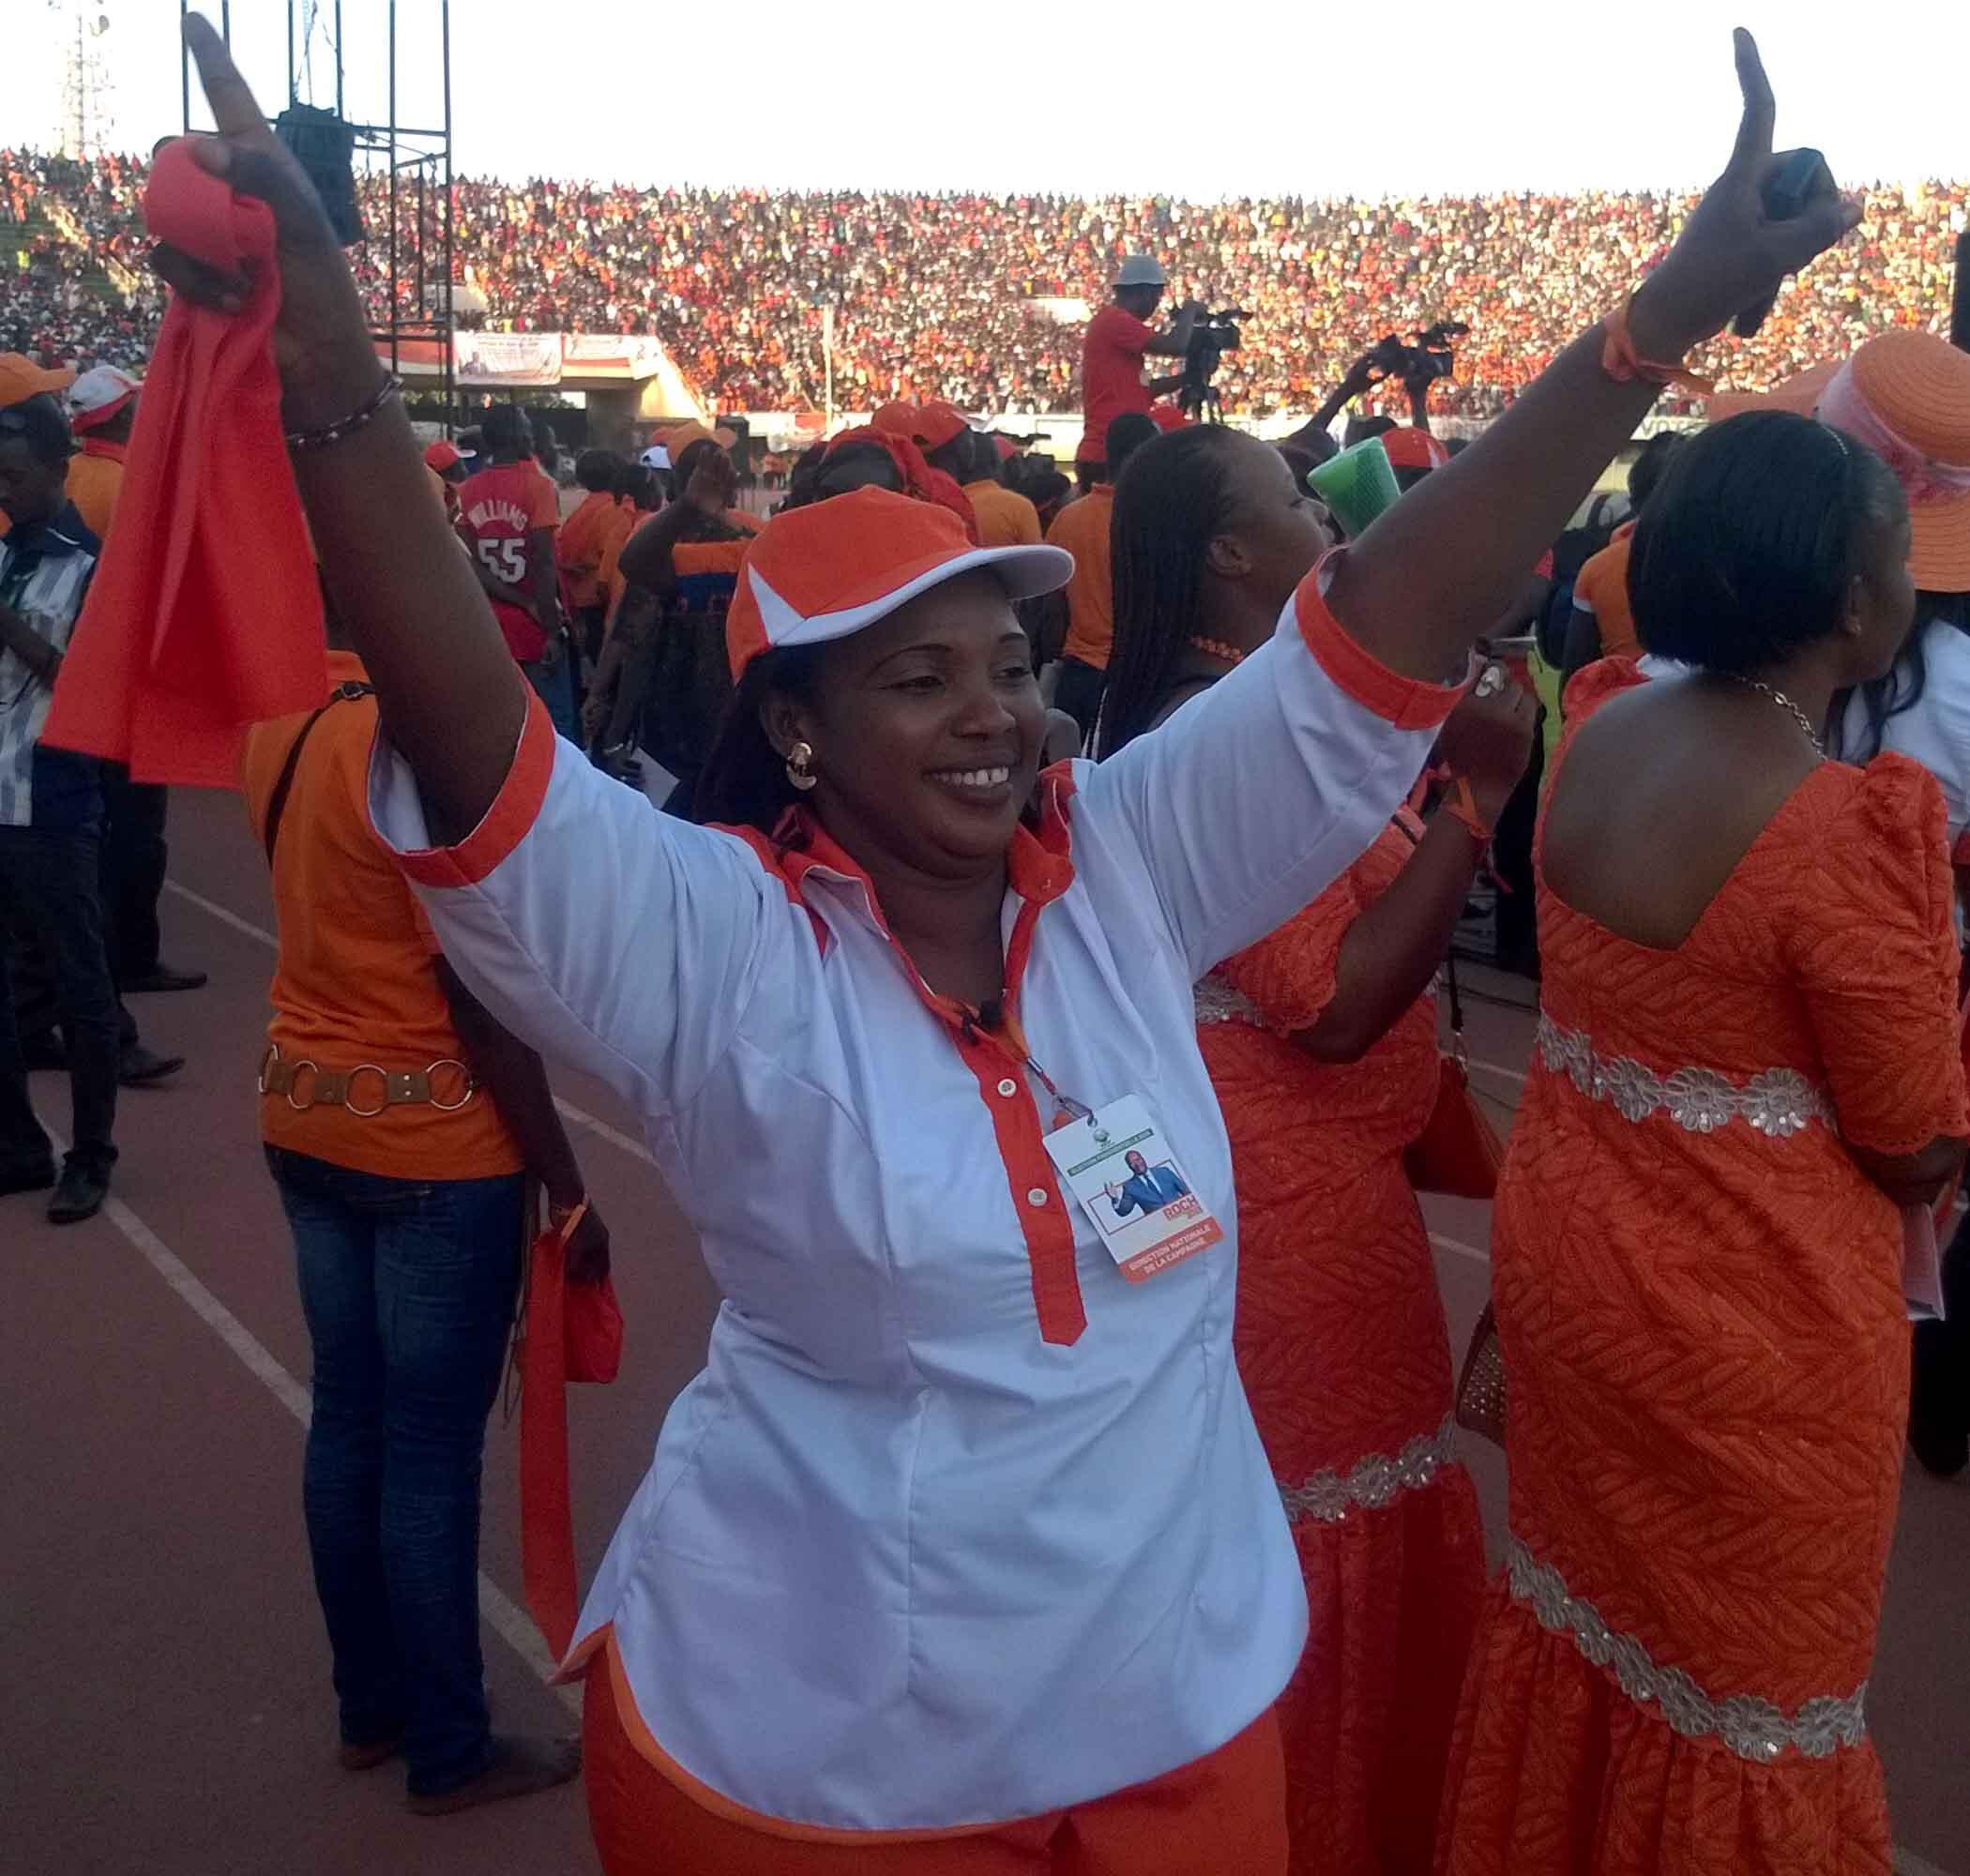 MPP supporter enjoys the music at Ouagadougou's 4th August stadium, 27 November 2015